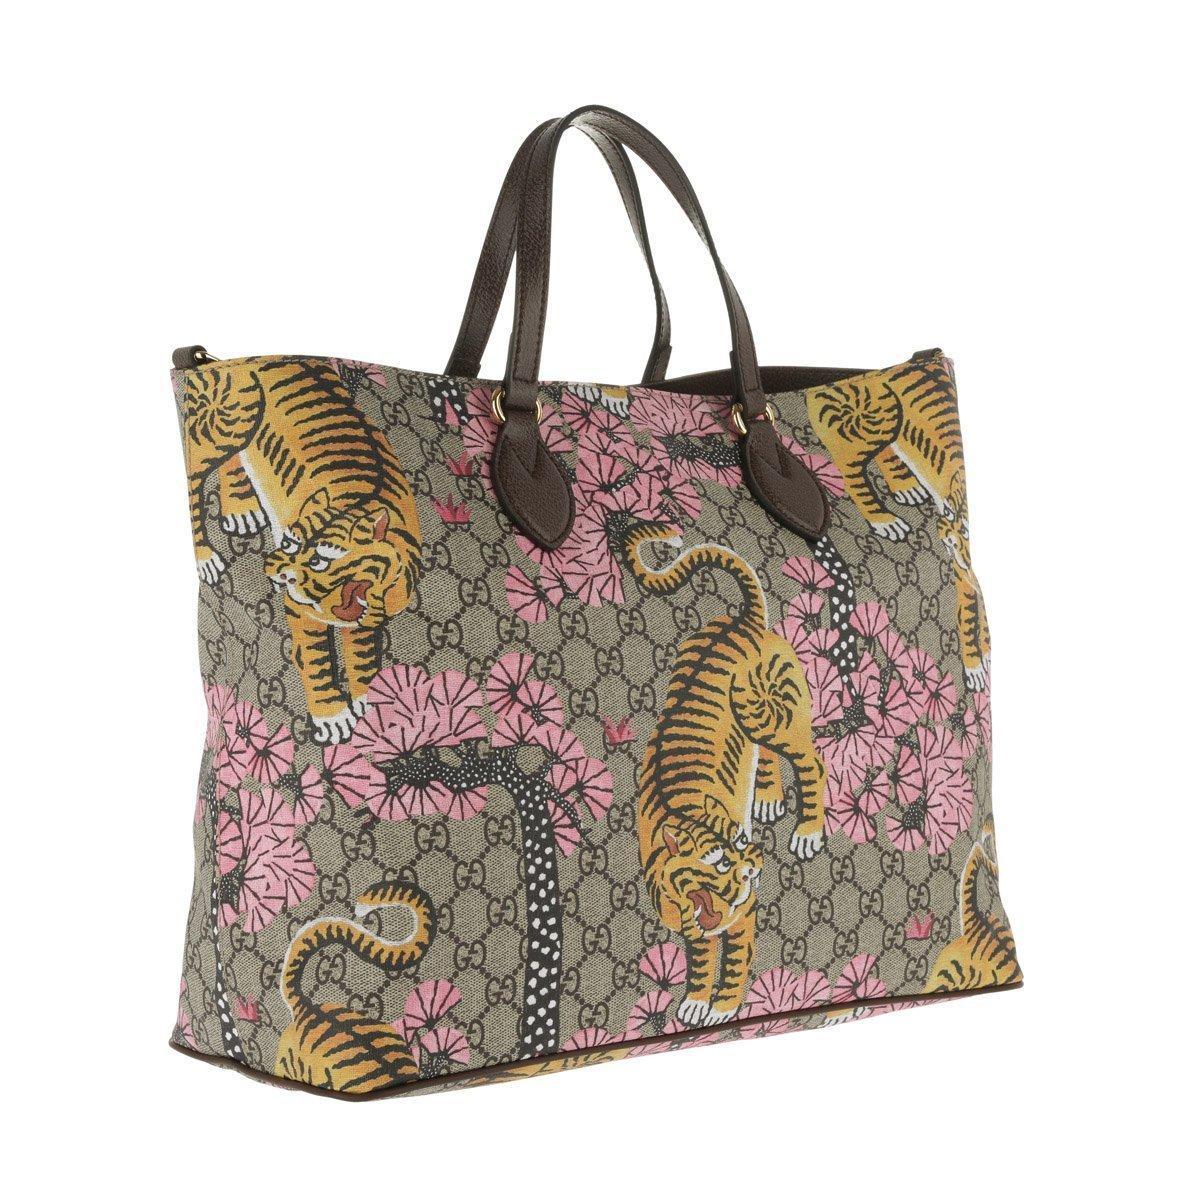 688e42bea8f0 Gucci - Multicolor Supreme Shopping Bag Bengal Ebony/brown - Lyst. View  fullscreen